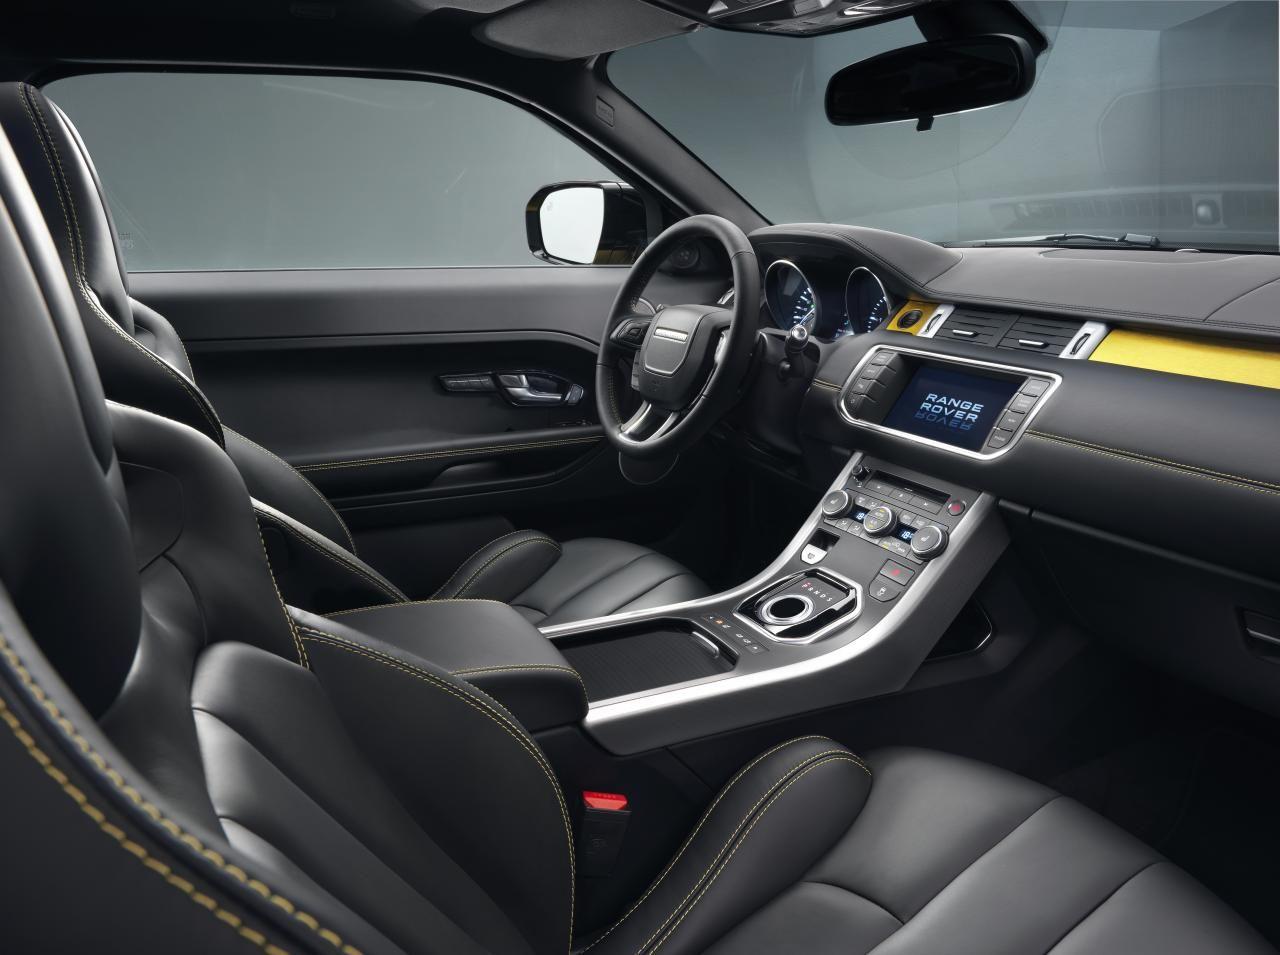 Katalog 2013 Land Rover Range Rover Evoque Sicilian Yellow Voiture Anglaise Voiture Semestre